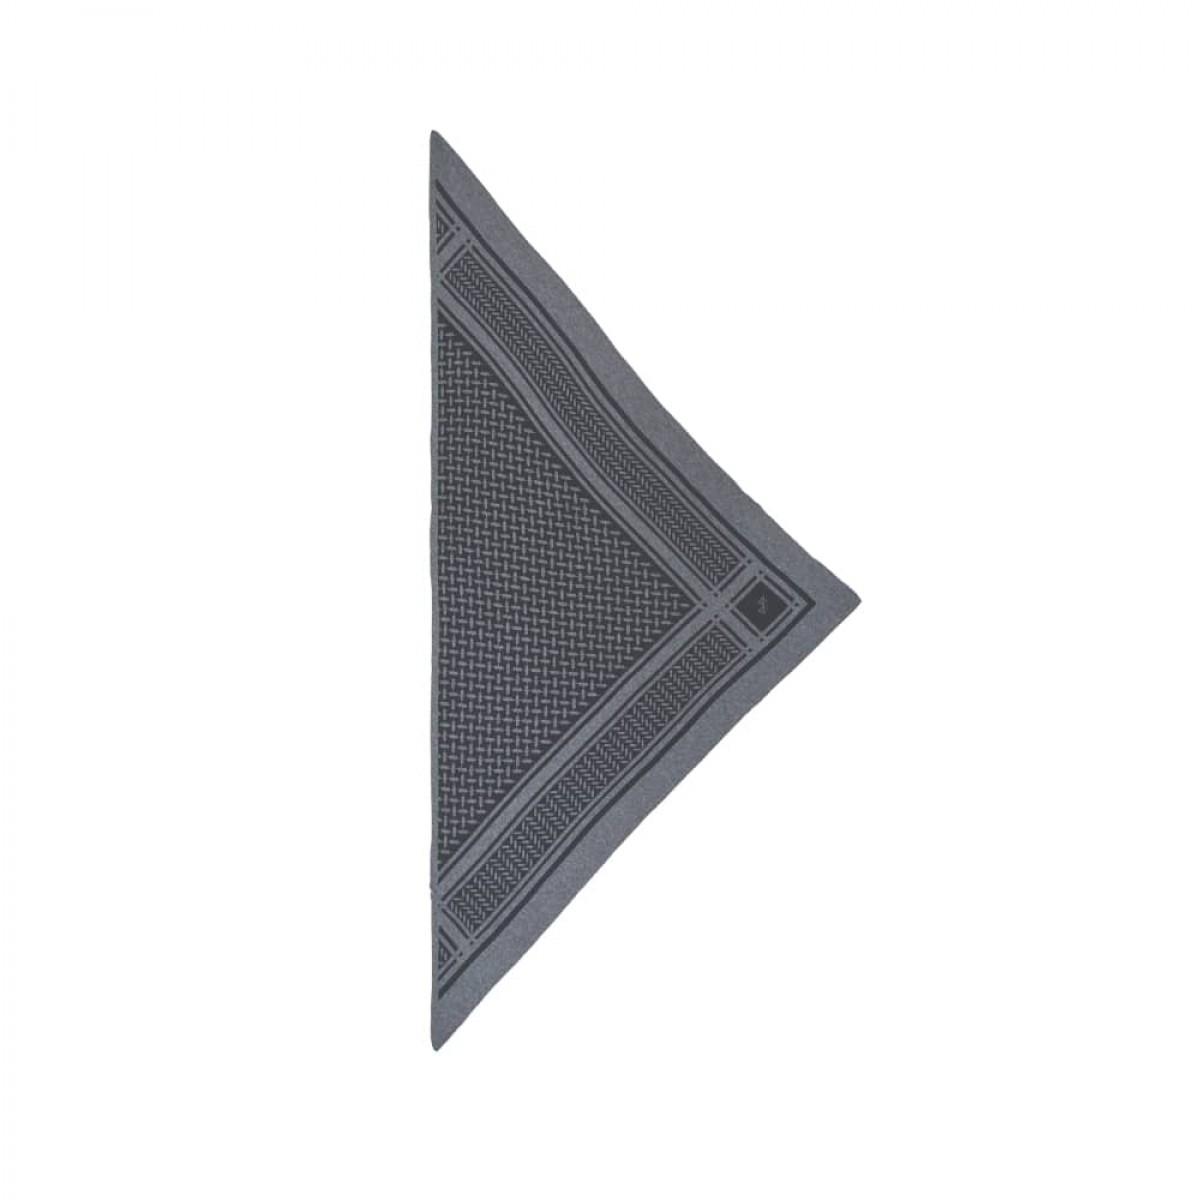 triangle trinity neo m - lubecca neo - front